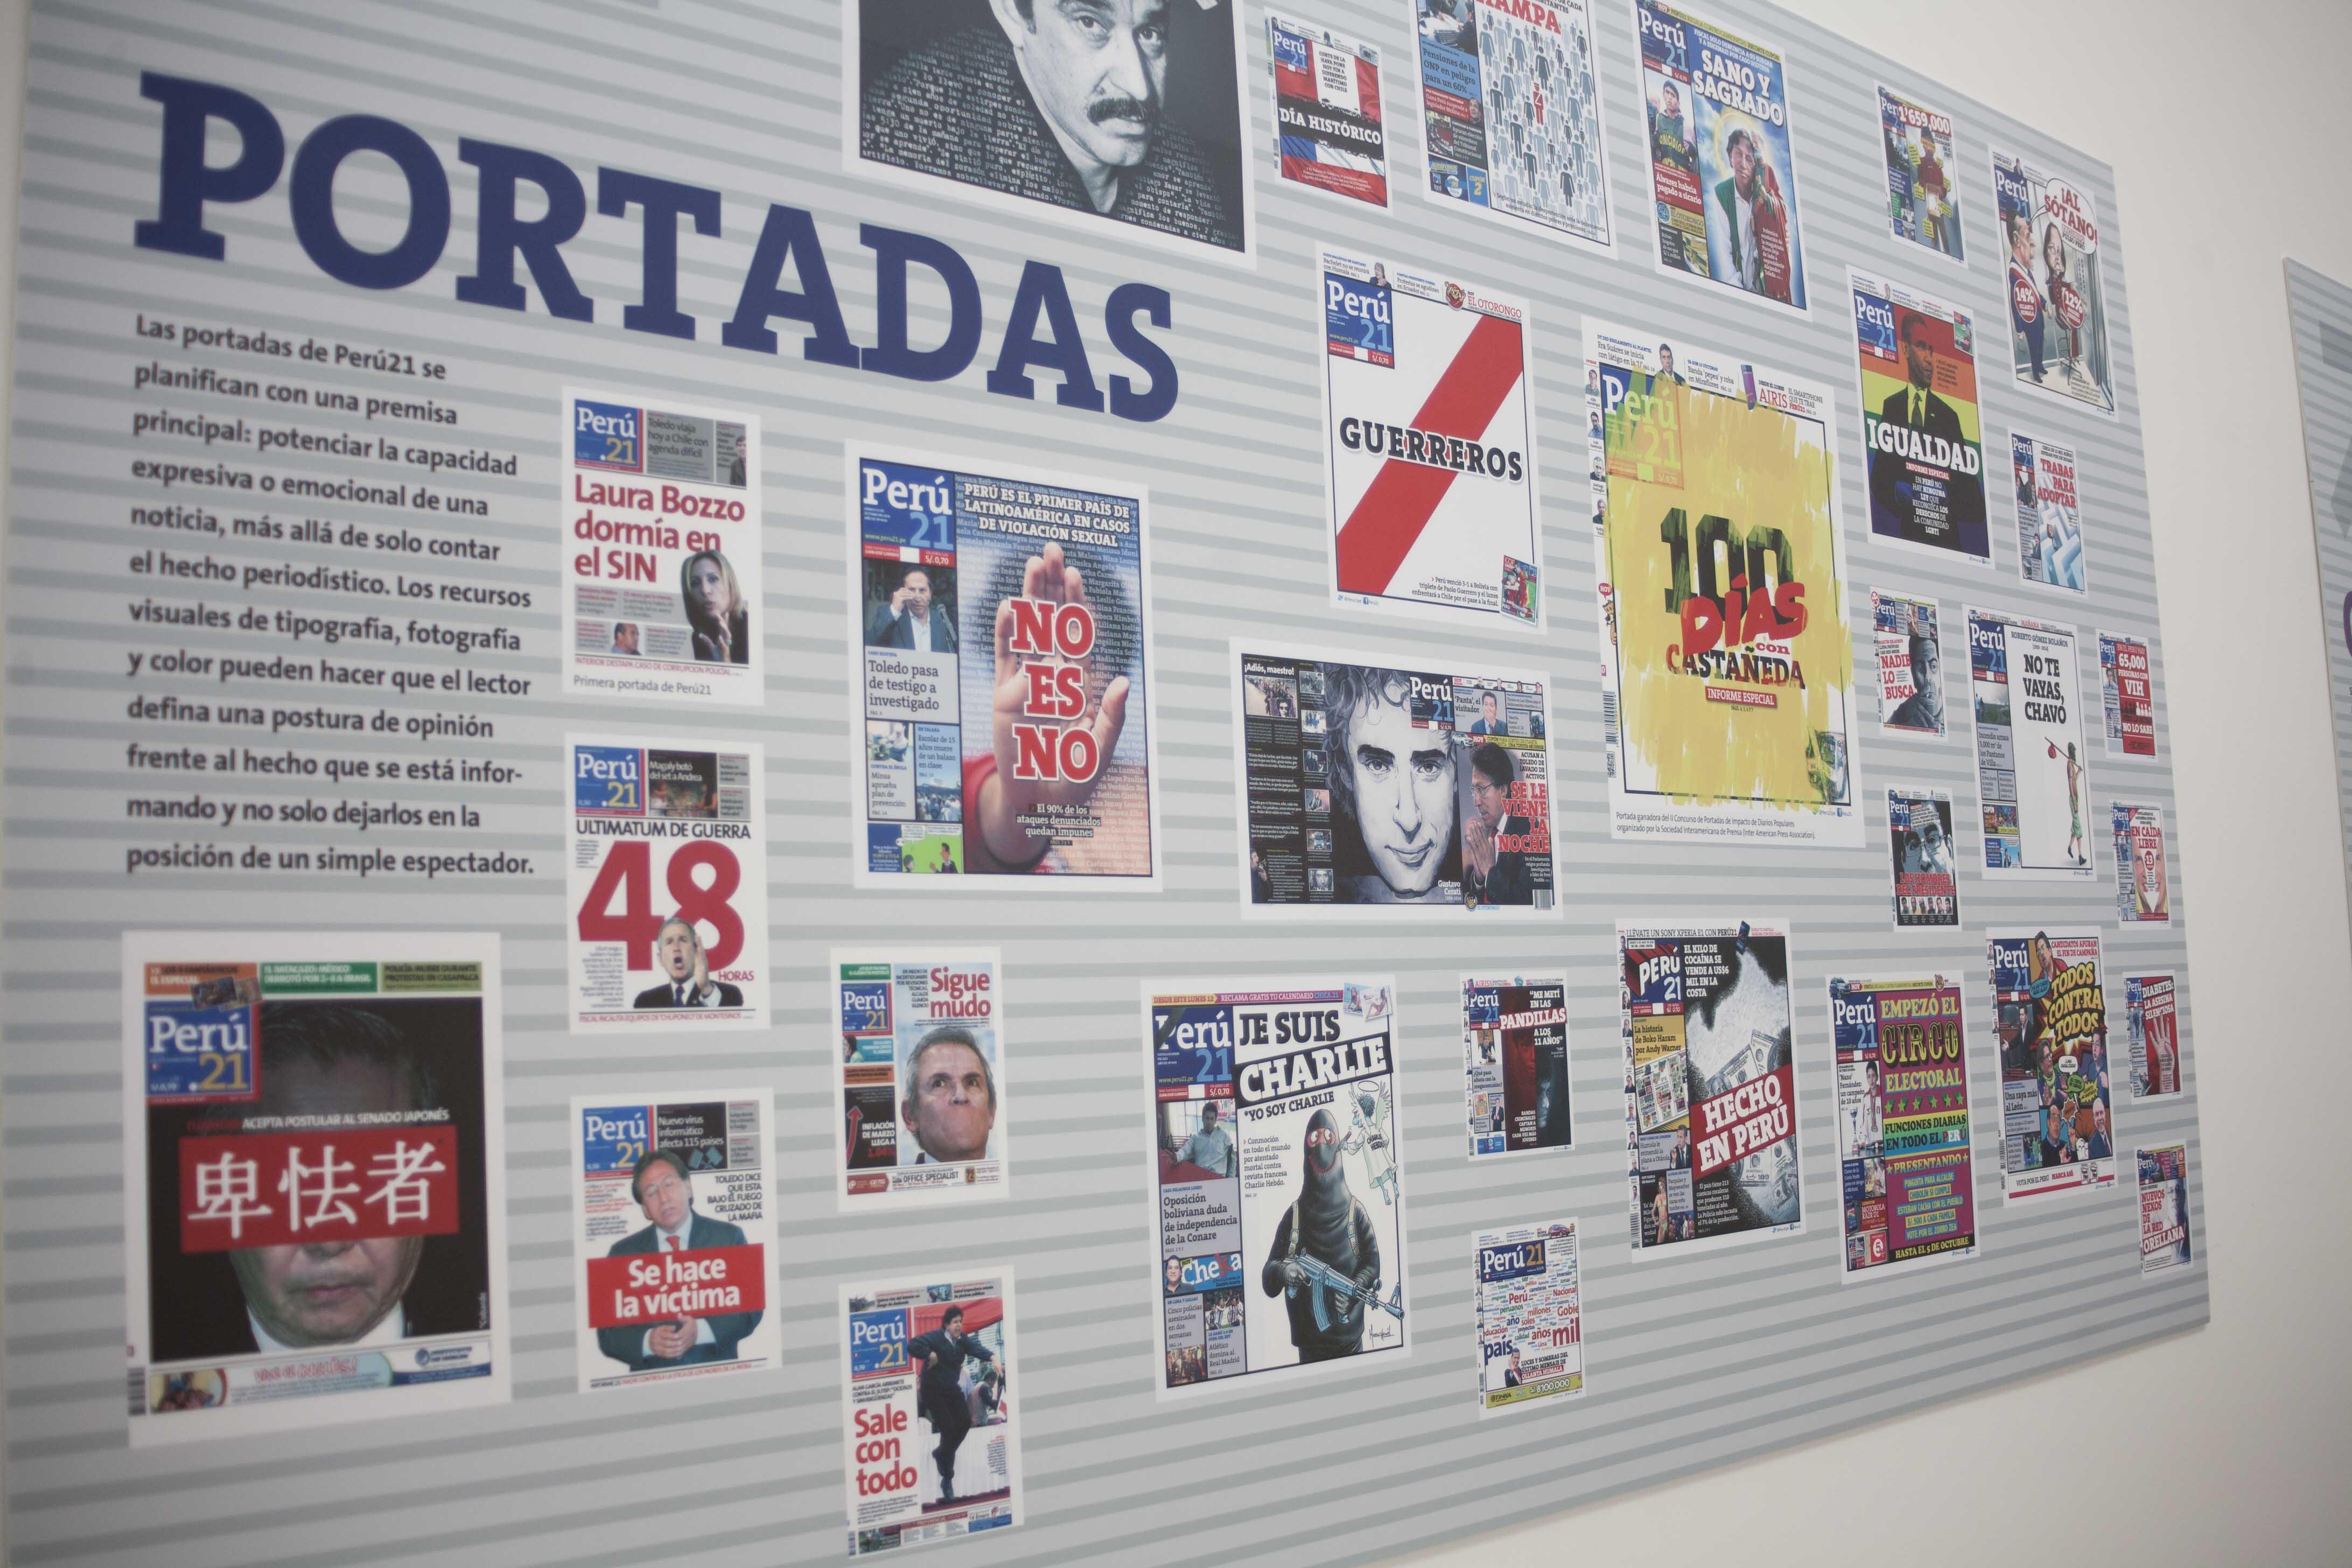 peru21 expo 4